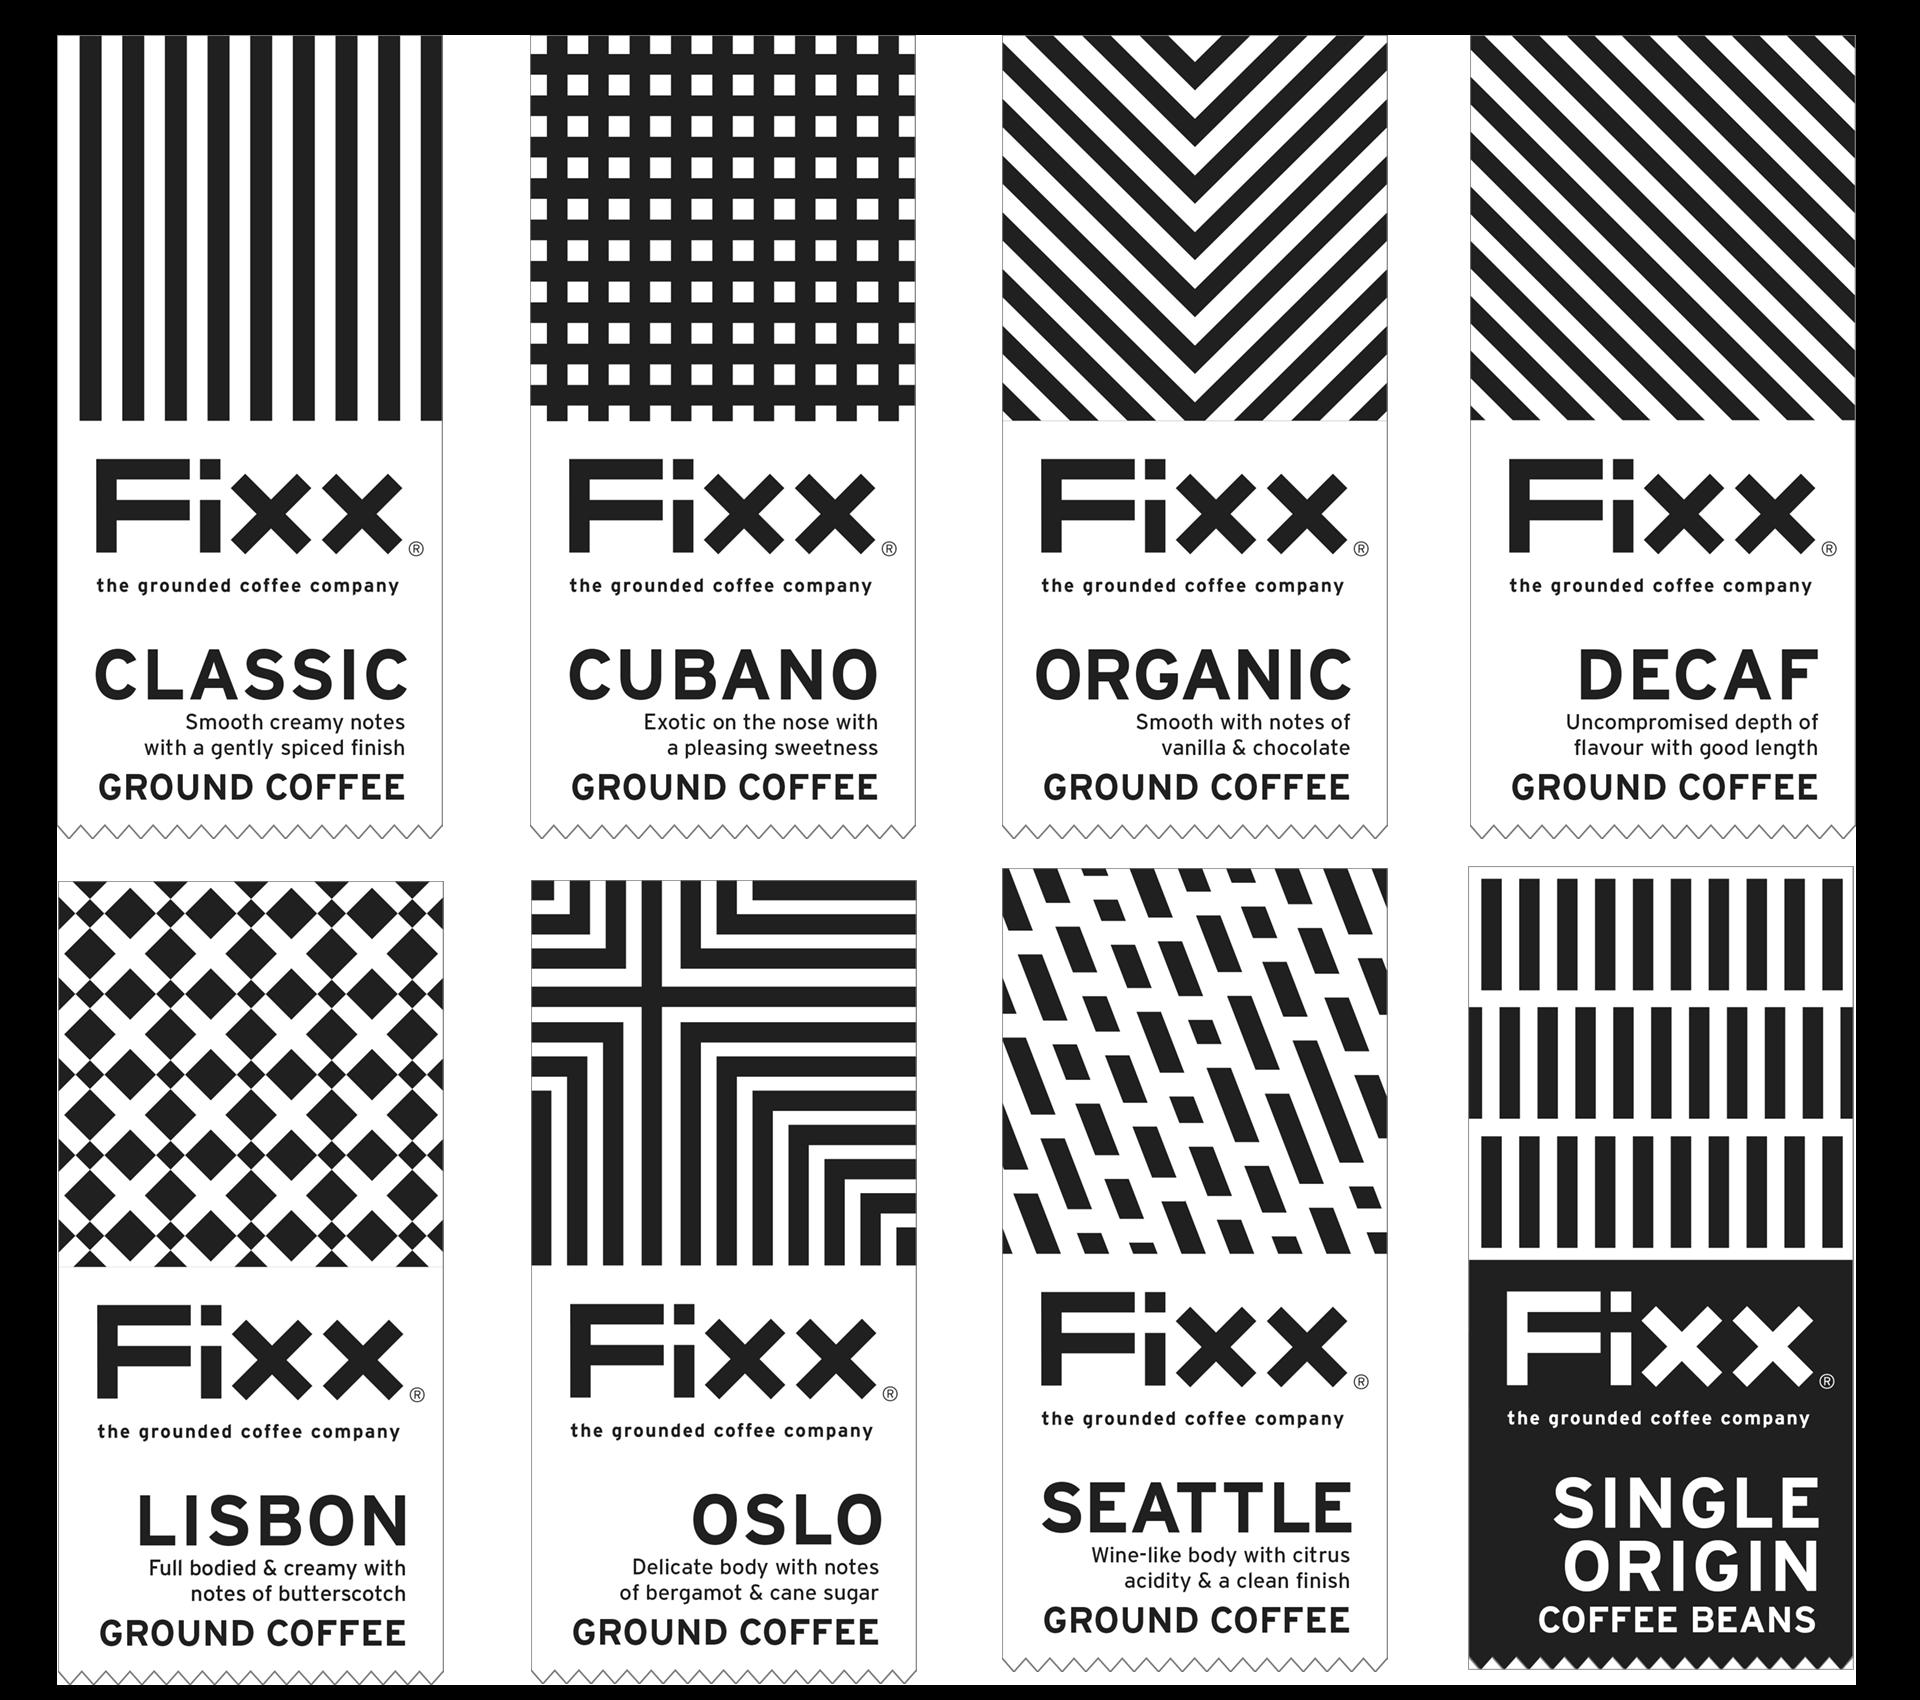 Fixx_LabelLayers.png